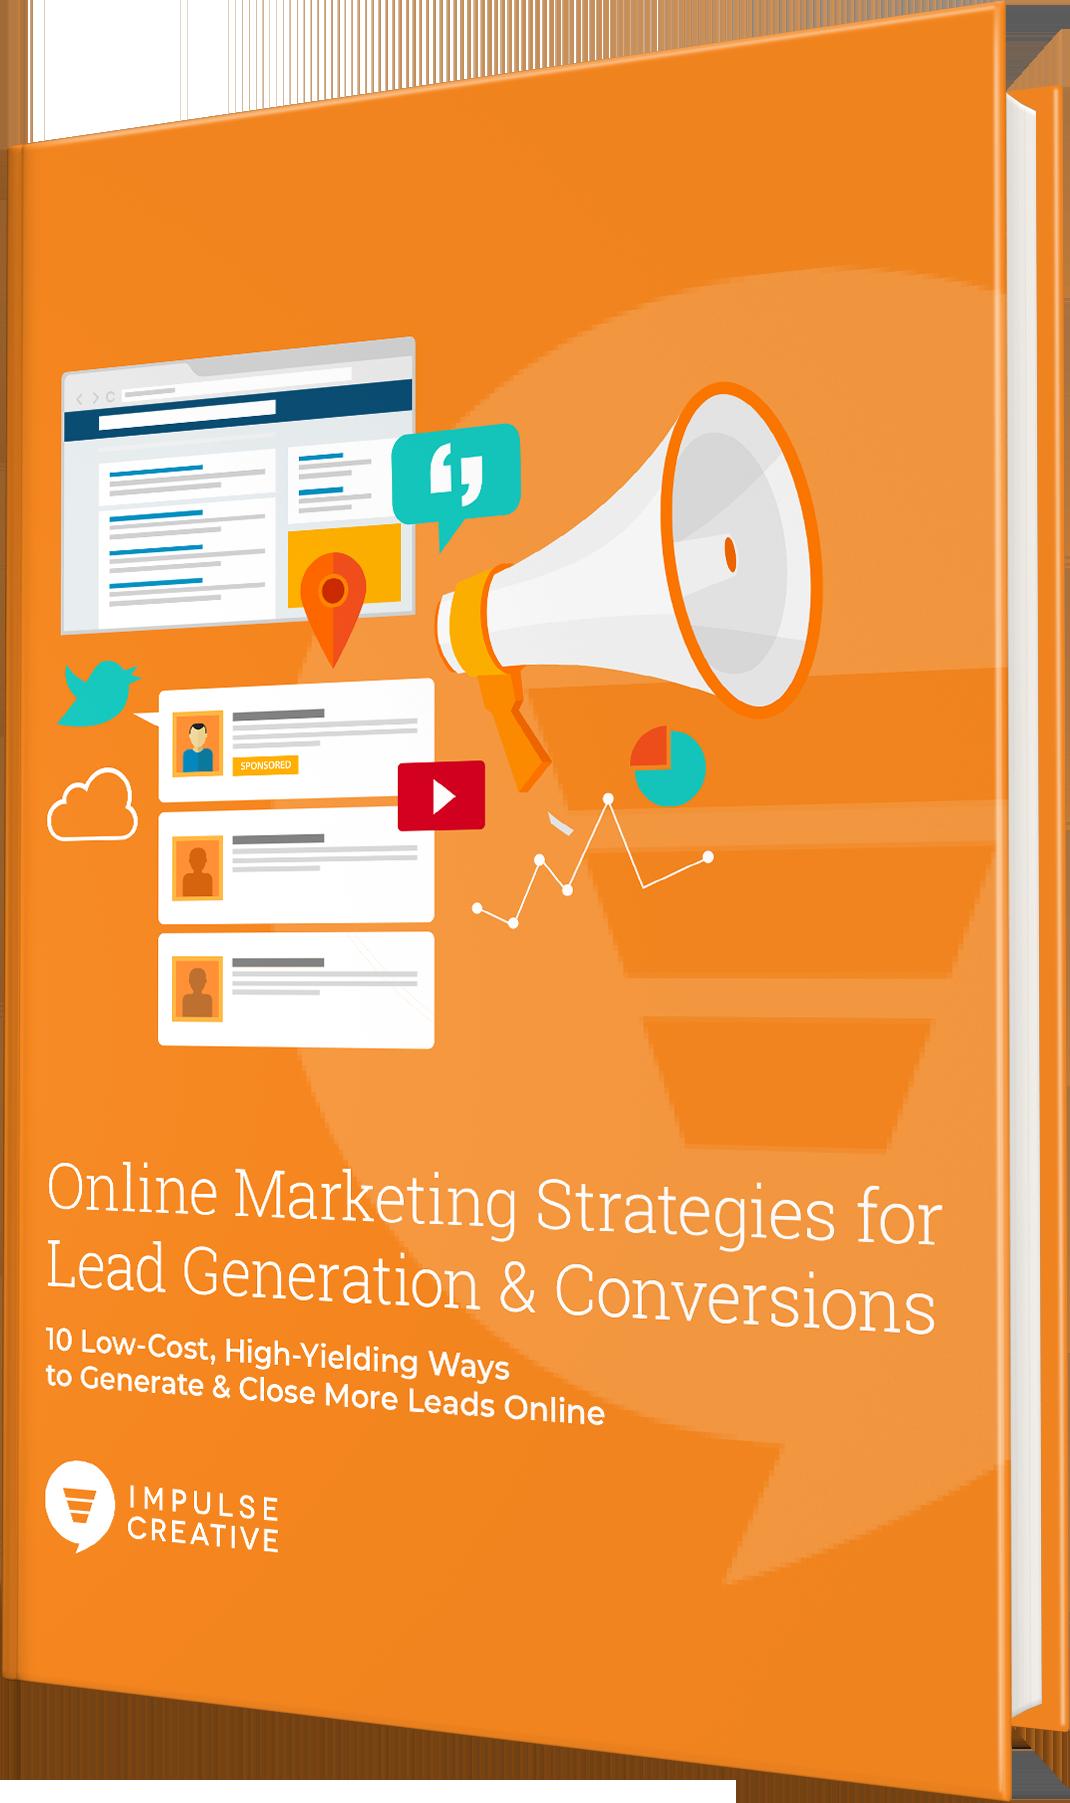 Online-Marketing-Strategies-Lead-Generation-Conversions